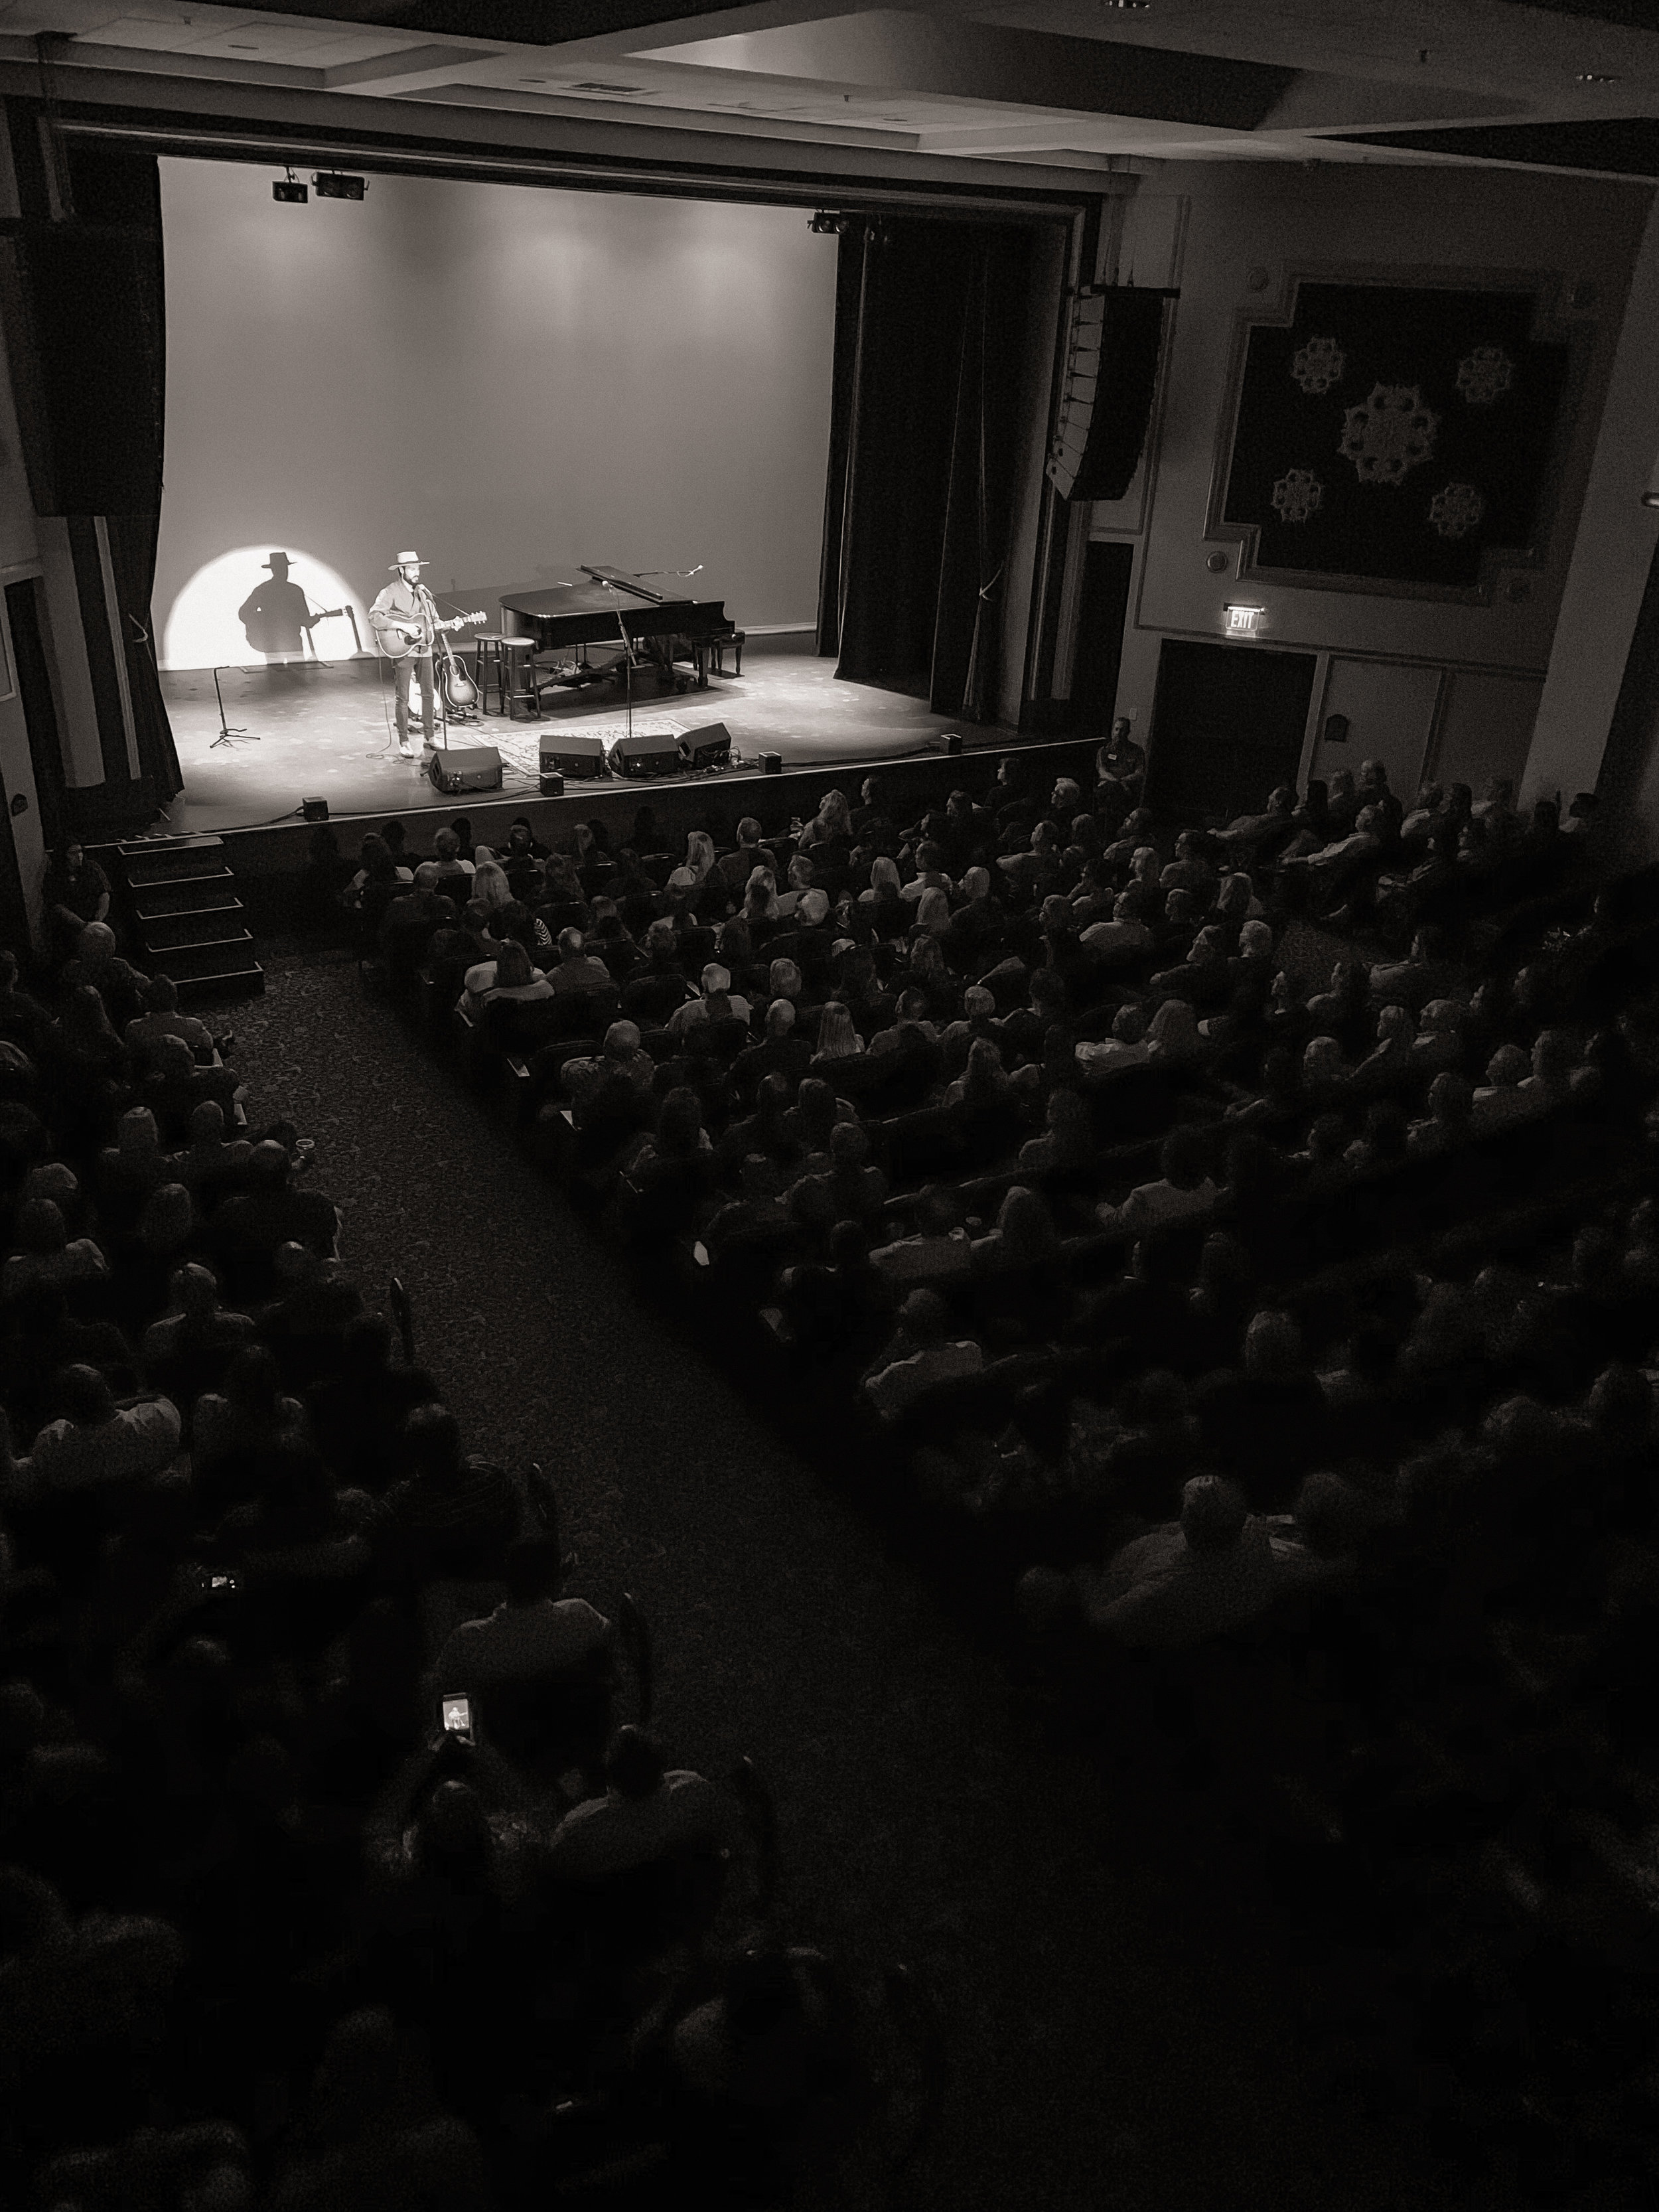 Michael_McArthur_Capitol_Theatre.jpg